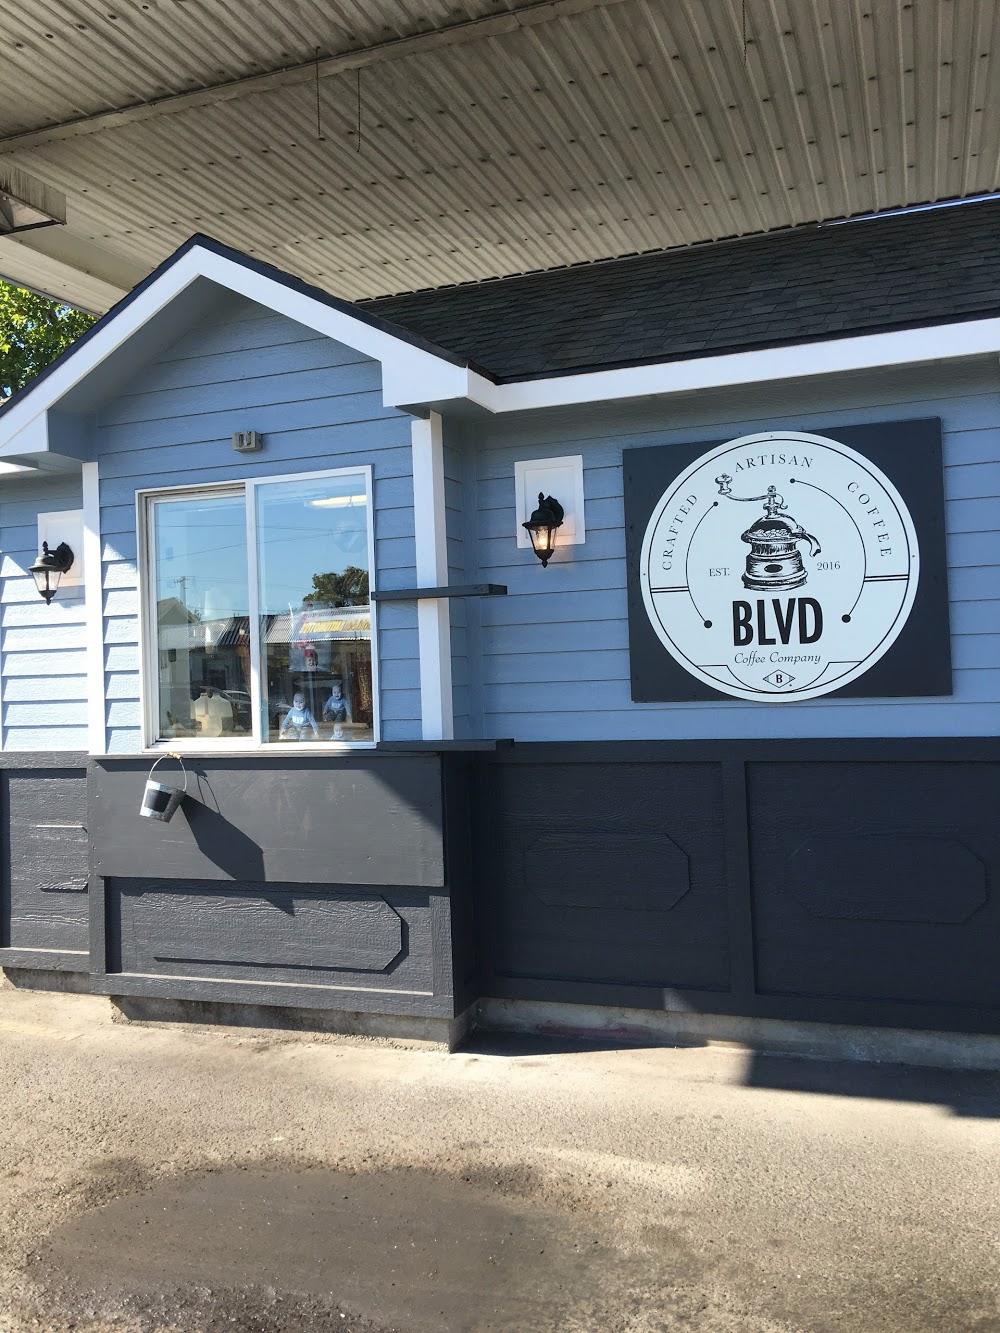 The Blvd Coffee Company